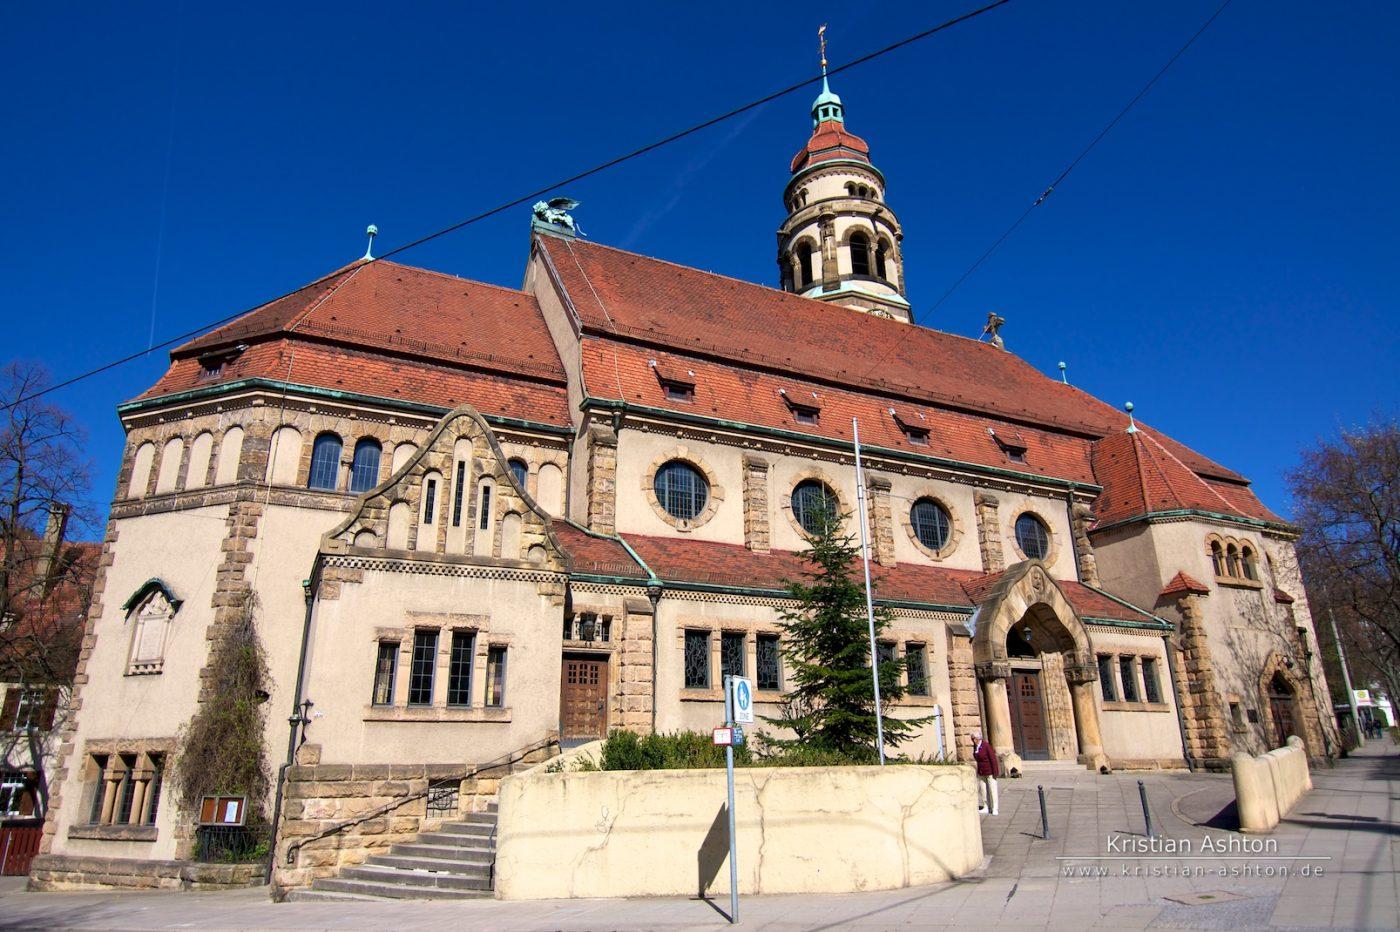 The Markus church